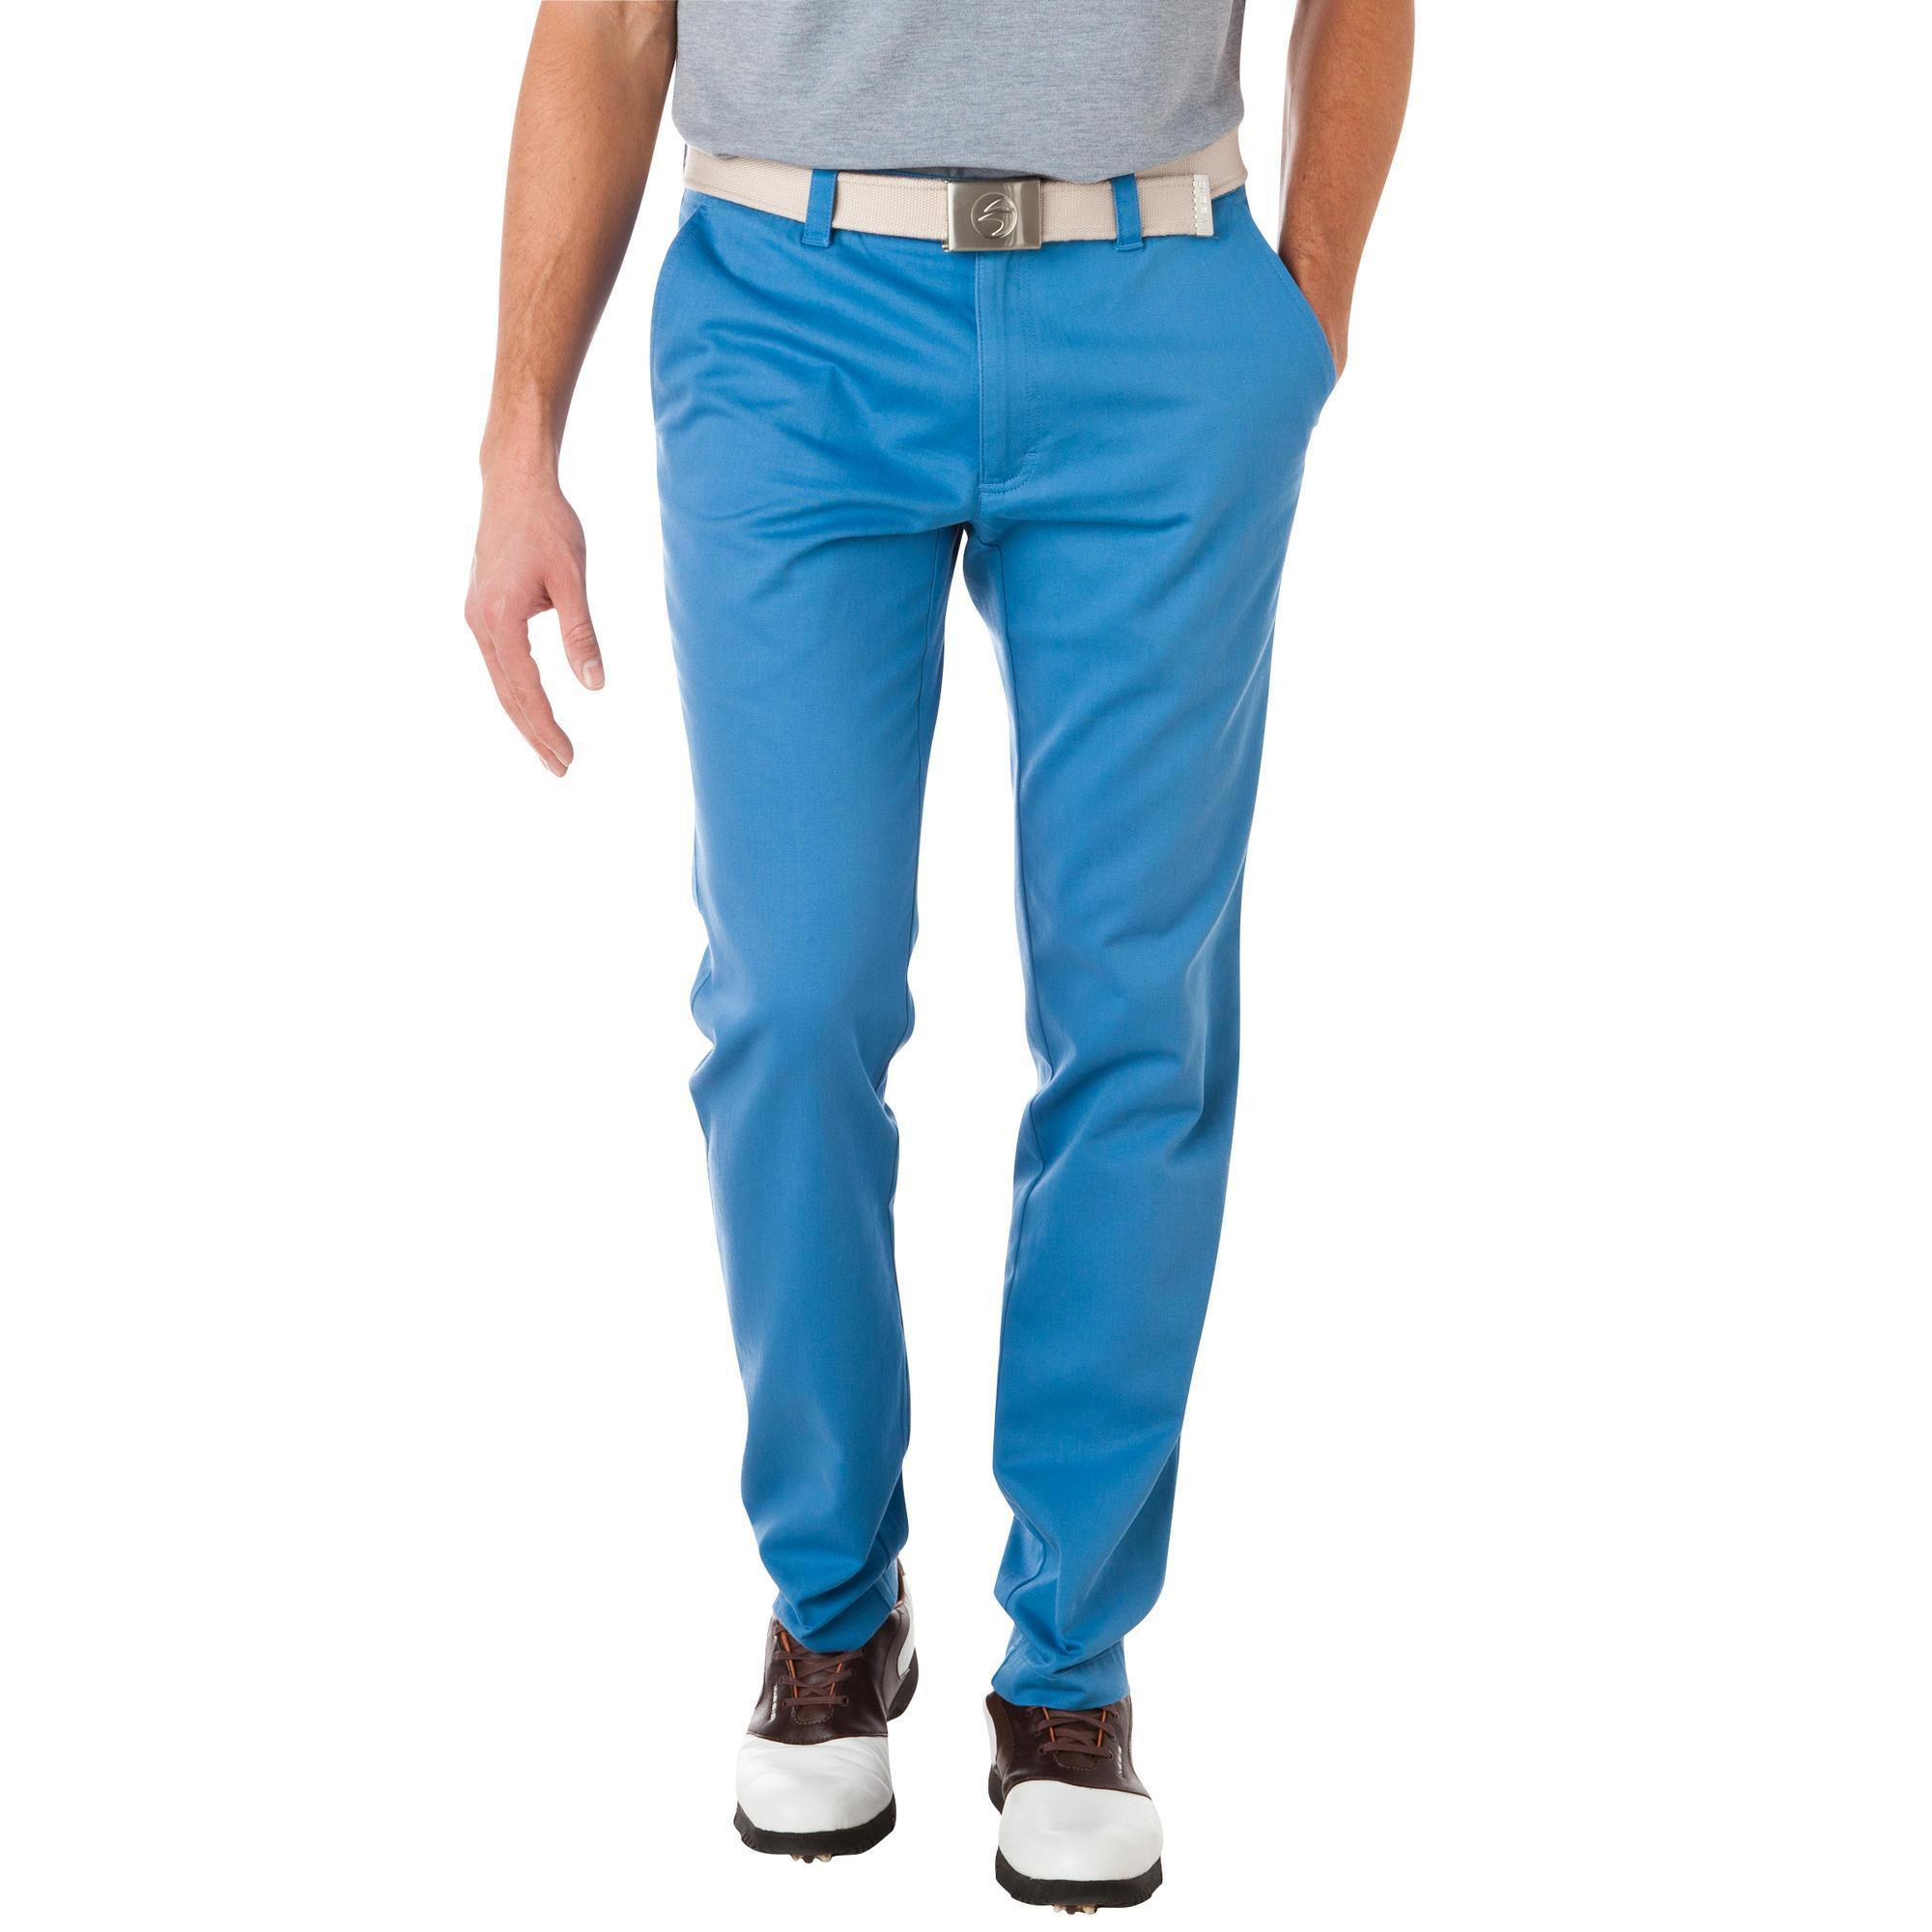 pantalon golf homme smar 39 tee bleu ciel inesis golf. Black Bedroom Furniture Sets. Home Design Ideas